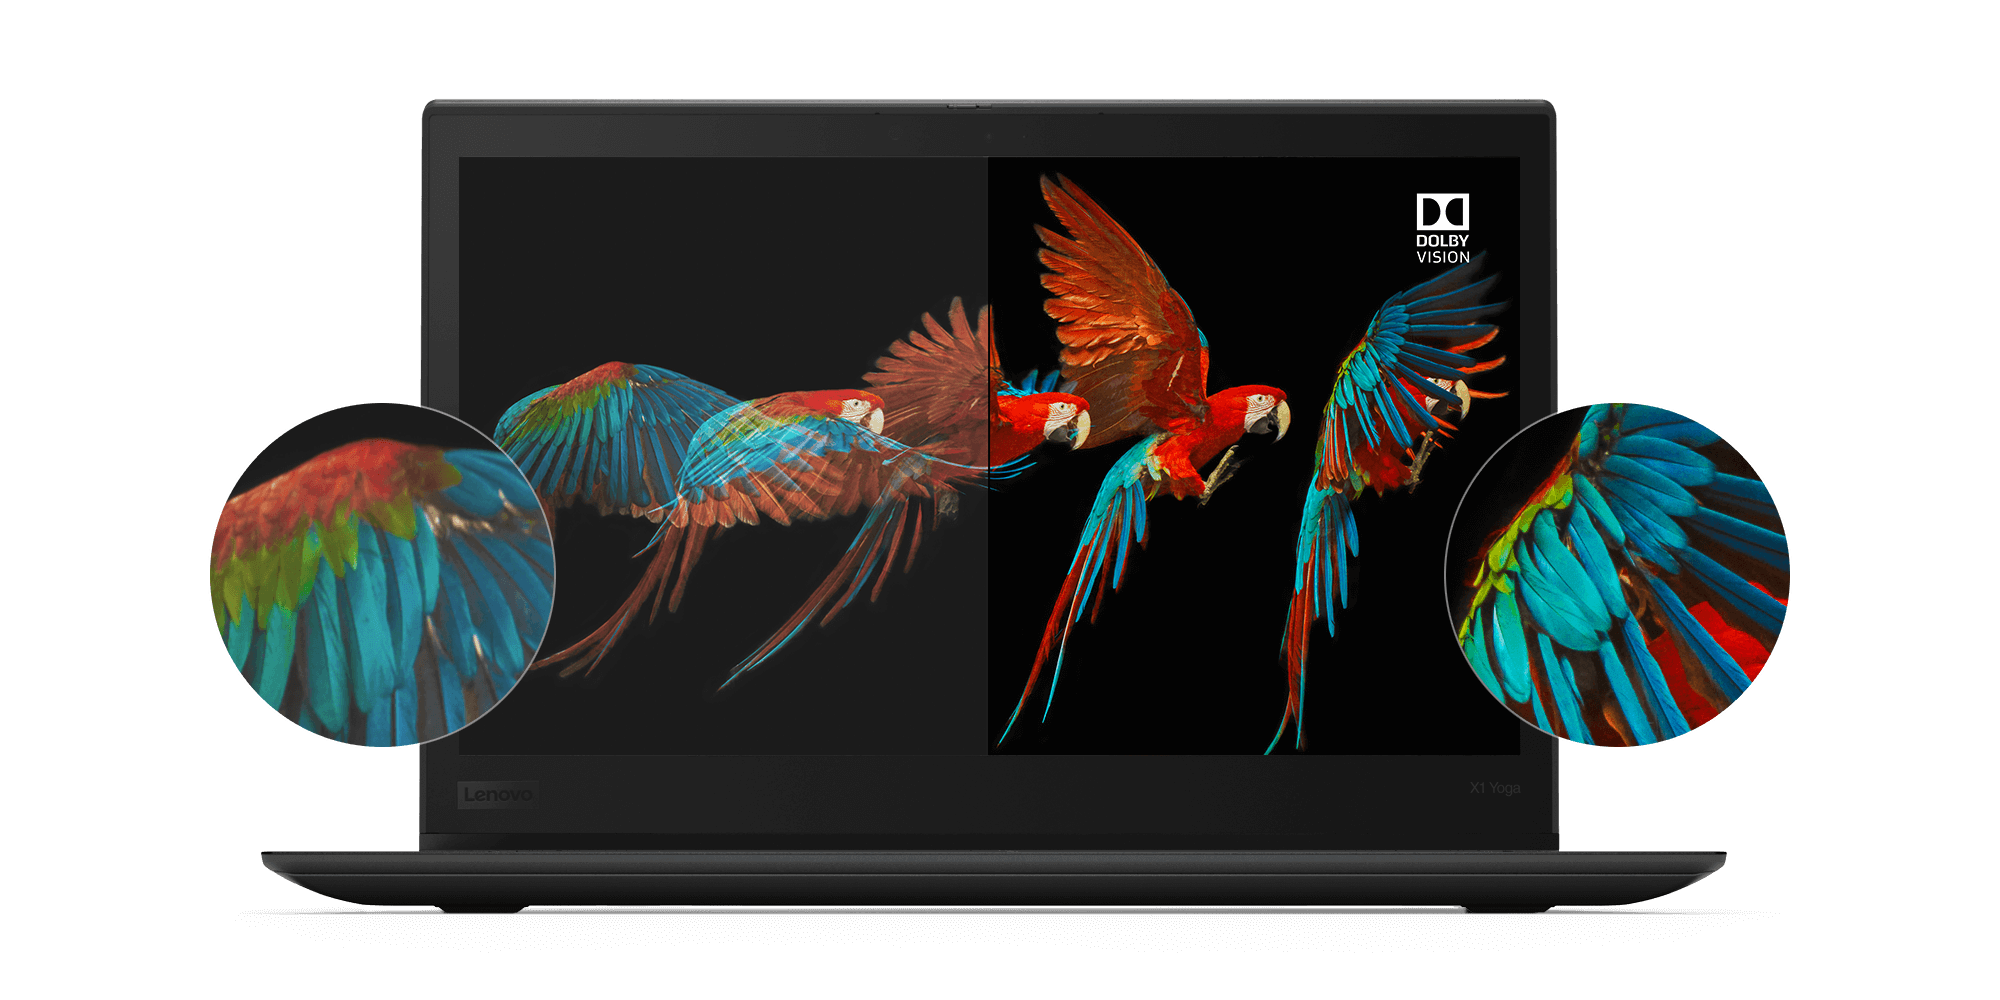 K&L puter Shop Lenovo ThinkPad X1 Yoga 20LF Flip Design Core i7 8550U 1 8 GHz Win 10 Pro 64 Bit 16 GB RAM 512 GB SSD TCG Opal Encry